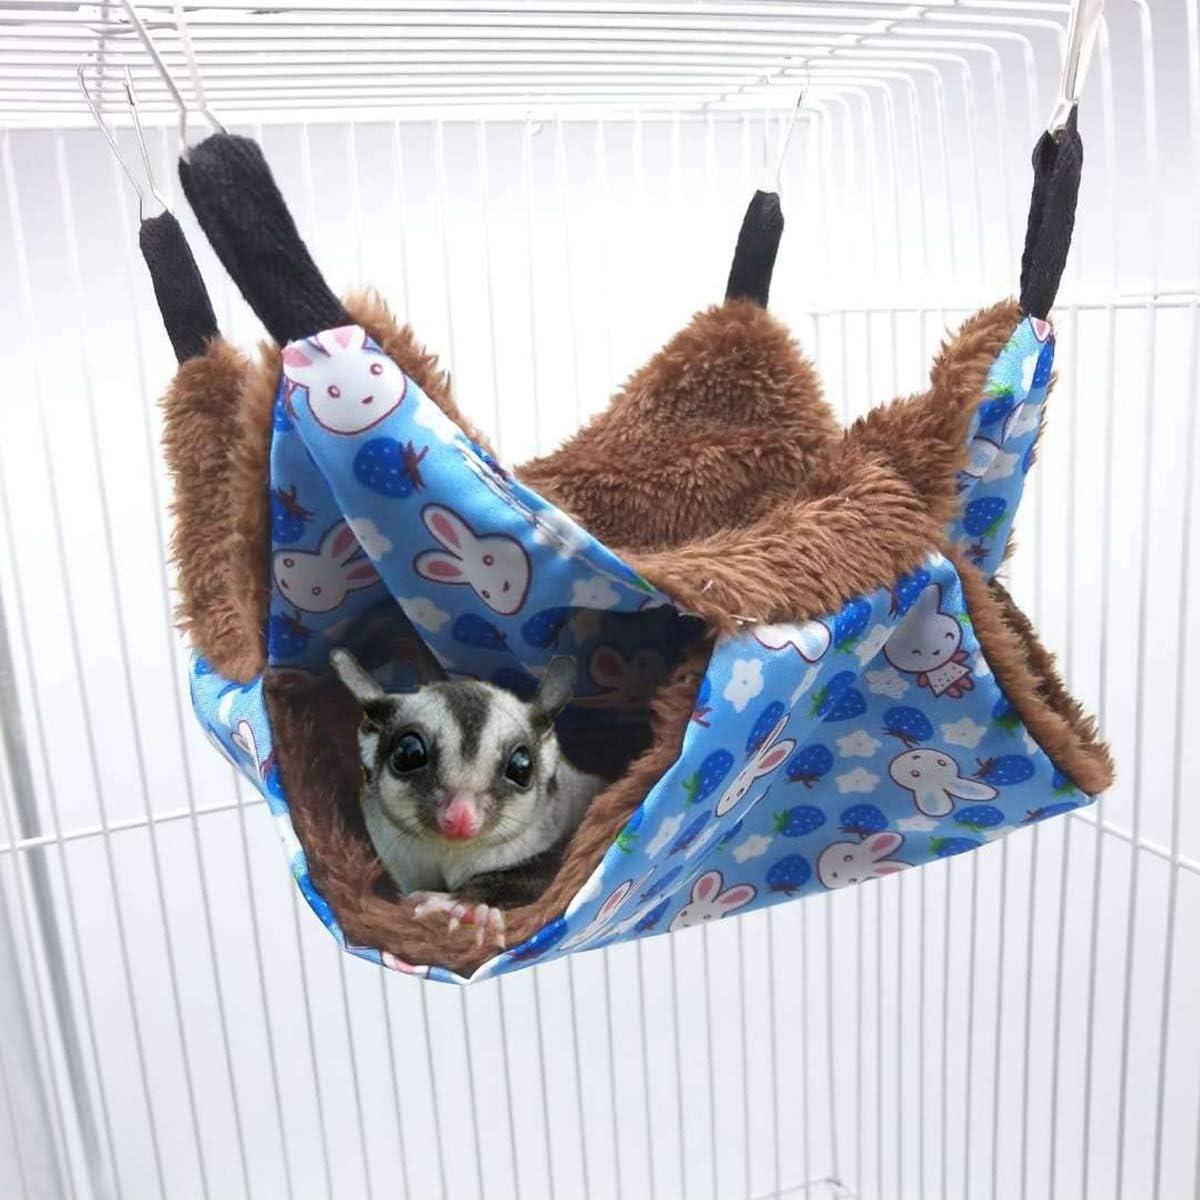 POPETPOP Rat Hammocks-Double Layer Hammock for Small Animal Ferret Guinea Pig Degu Gerbil Mice Hamster Chincilla Hammock Sleeper Cage Accessories-Small Blue